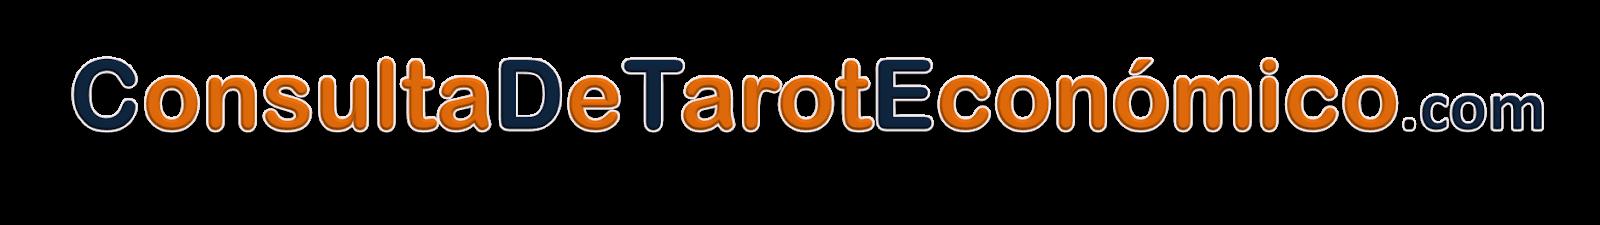 Consulta de Tarot Económico por Visa 15m/5€ y Tarot Barato 806 Fiable